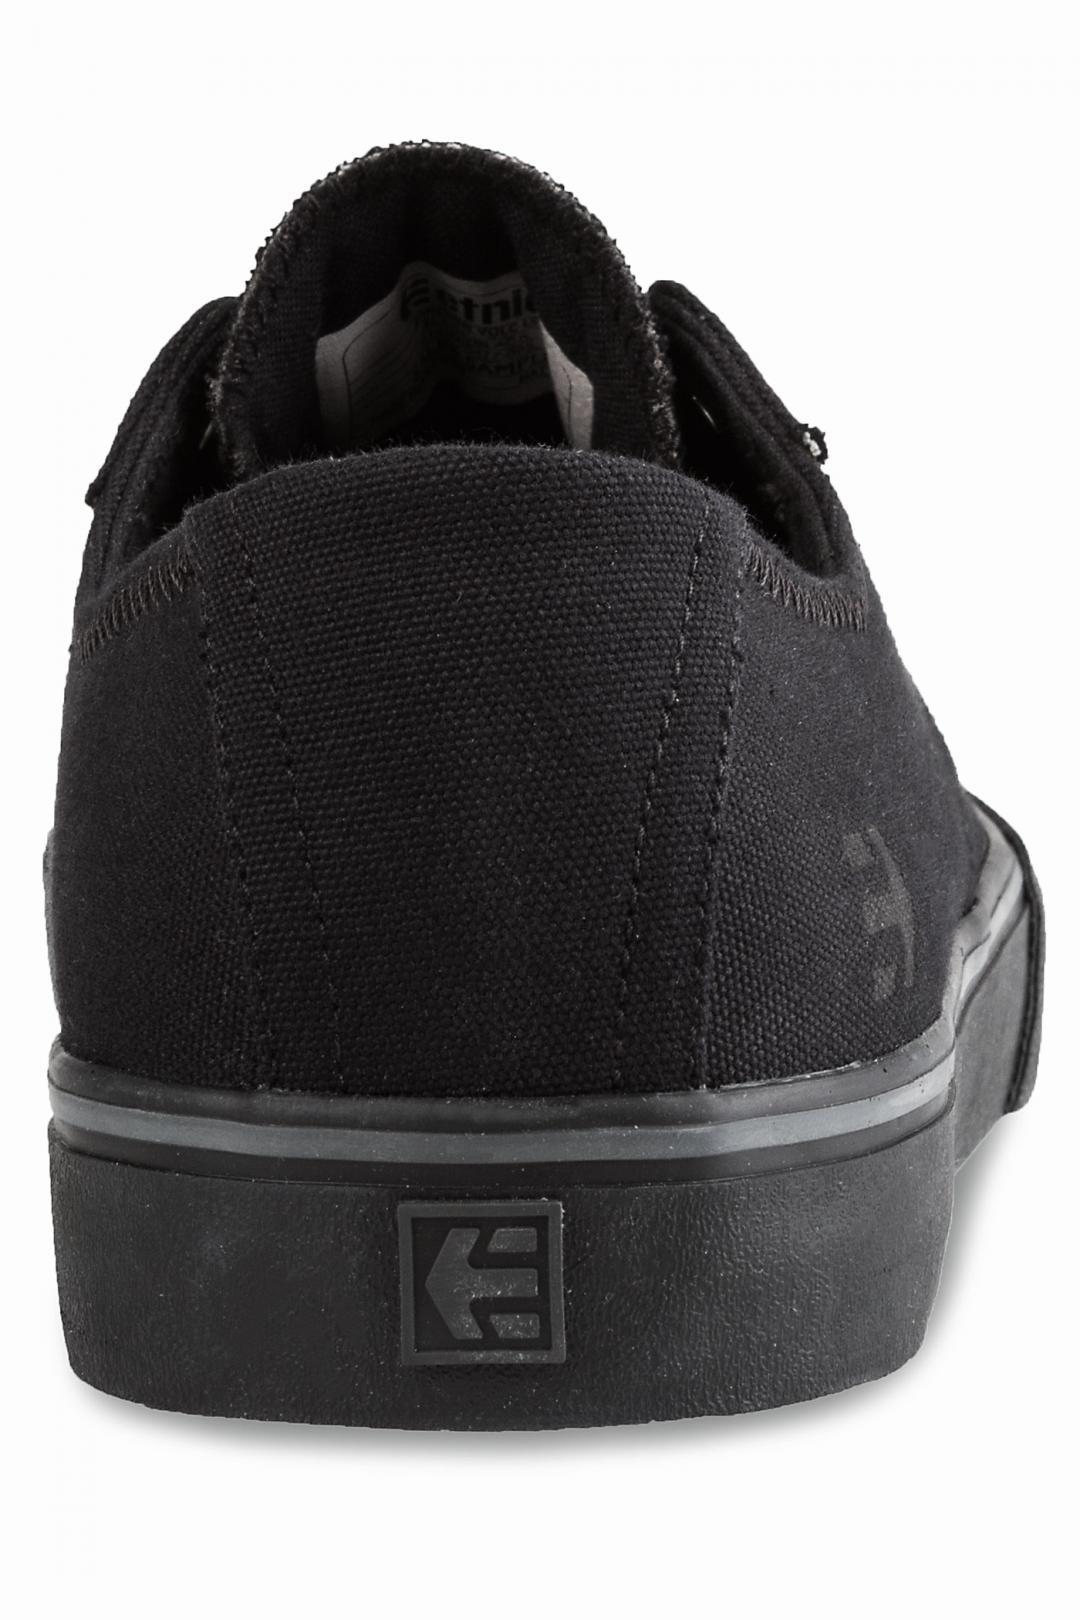 Uomo Etnies Jameson Vulc LS black black | Sneakers low top